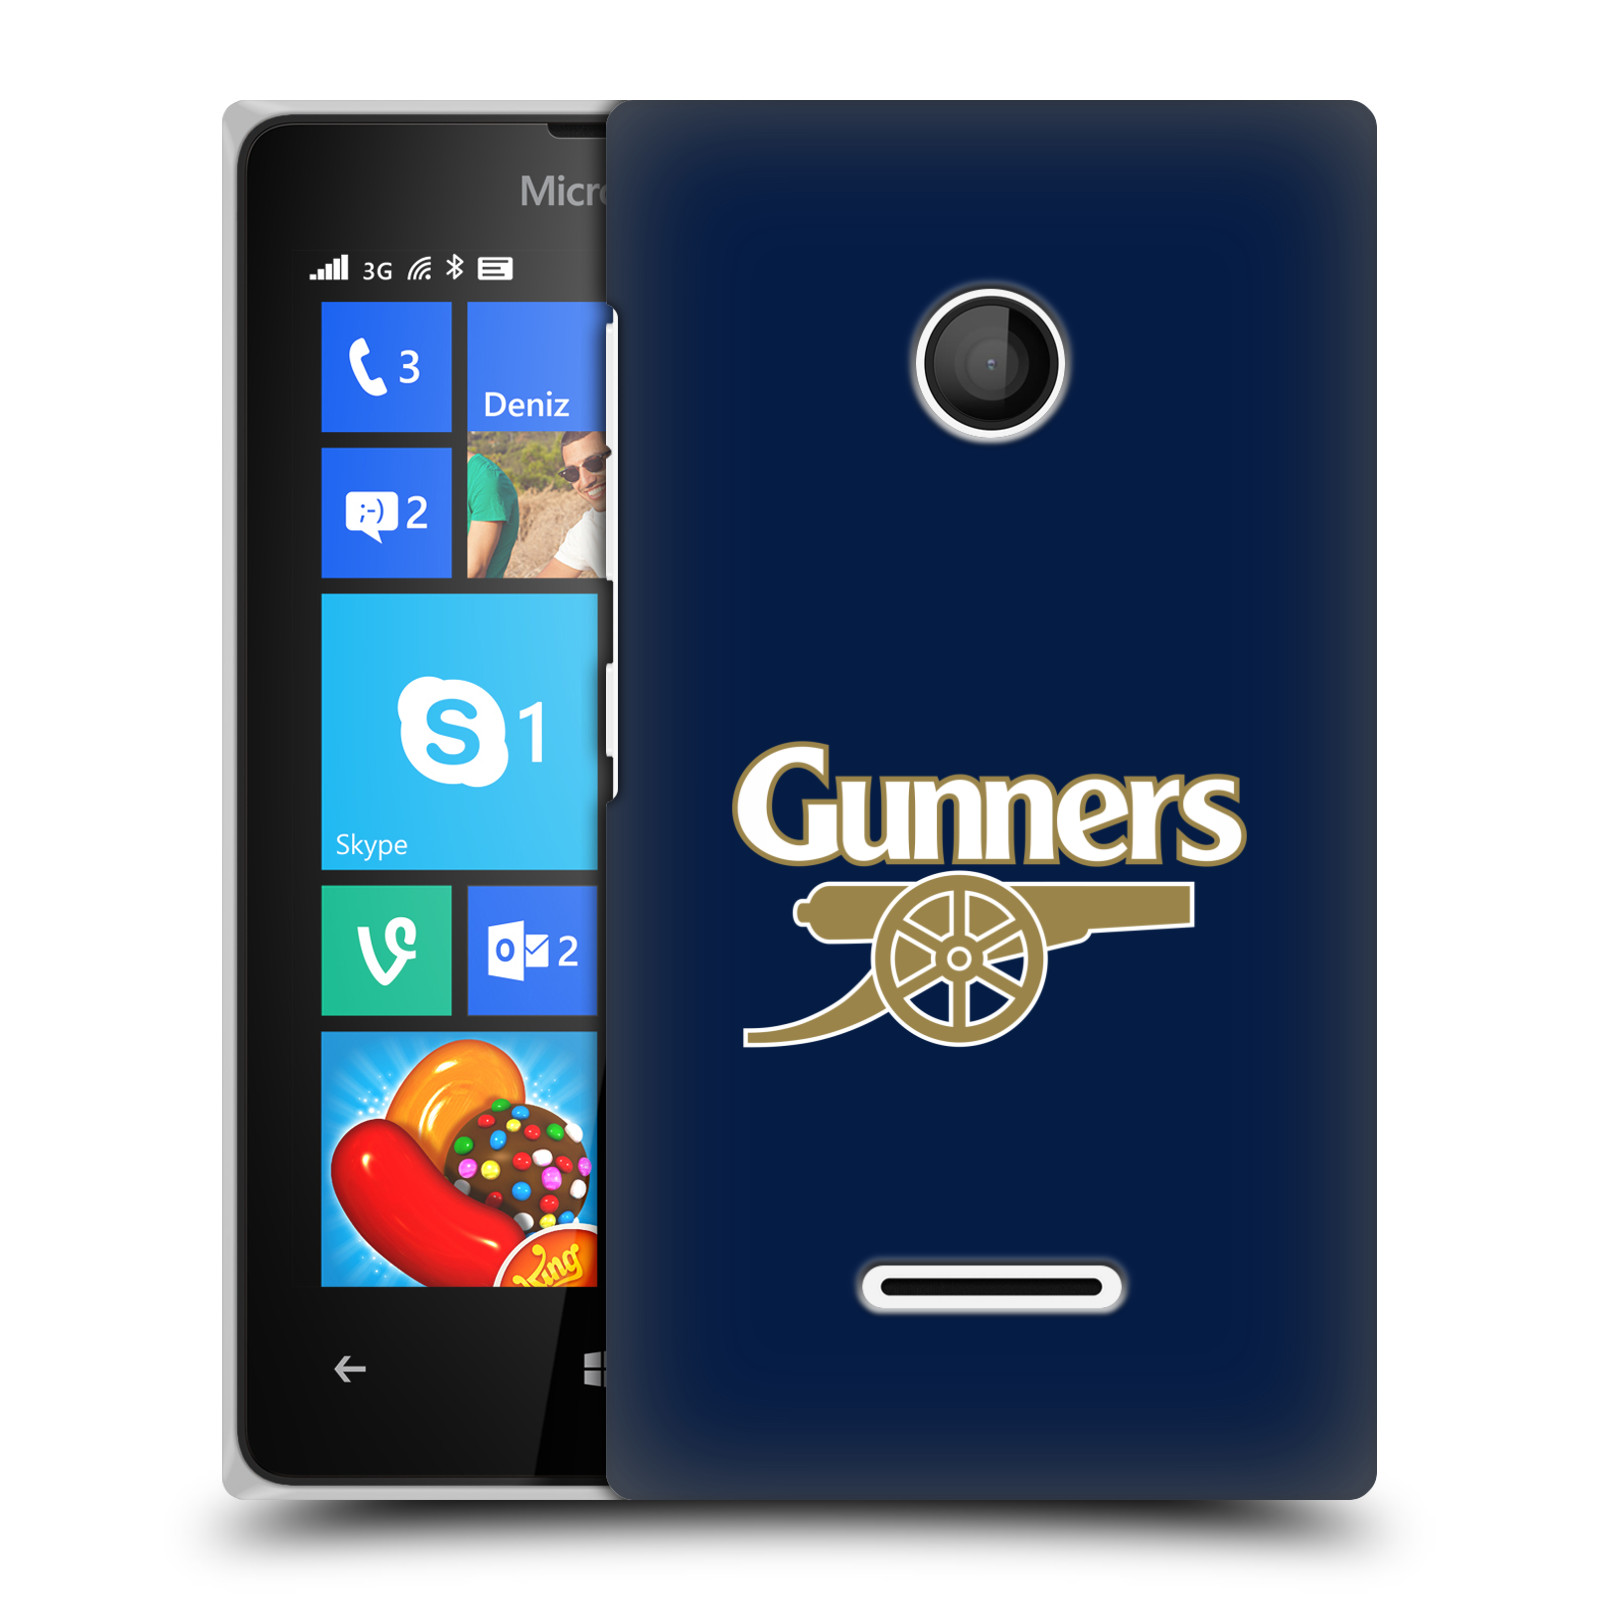 Plastové pouzdro na mobil Microsoft Lumia 435 - Head Case - Arsenal FC - Gunners